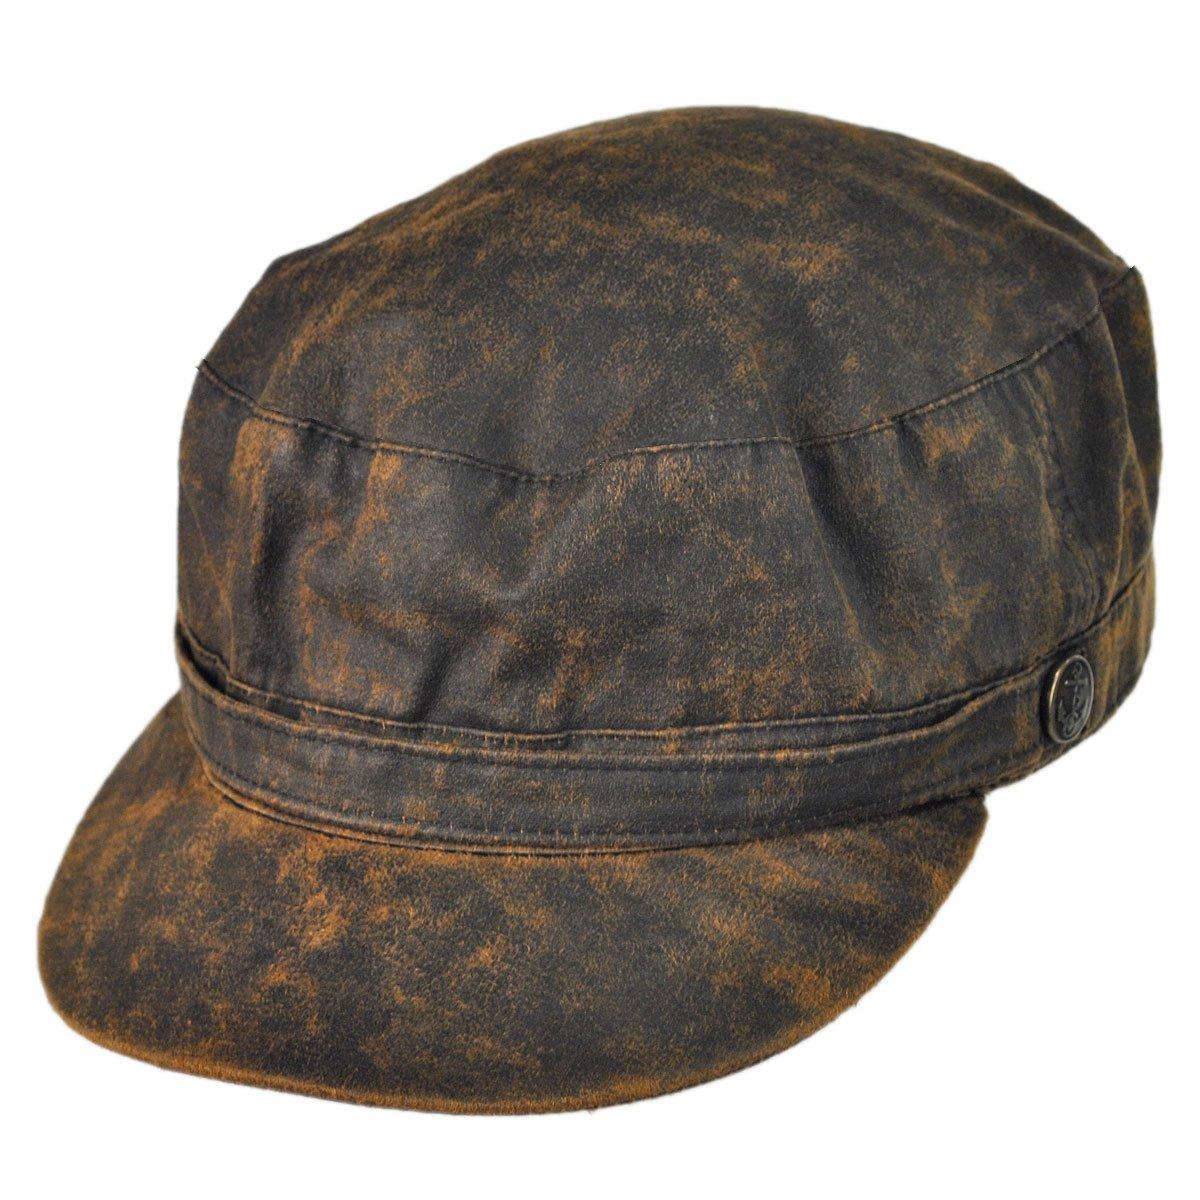 Jaxon Weathered Cotton Cadet Cap (Medium)